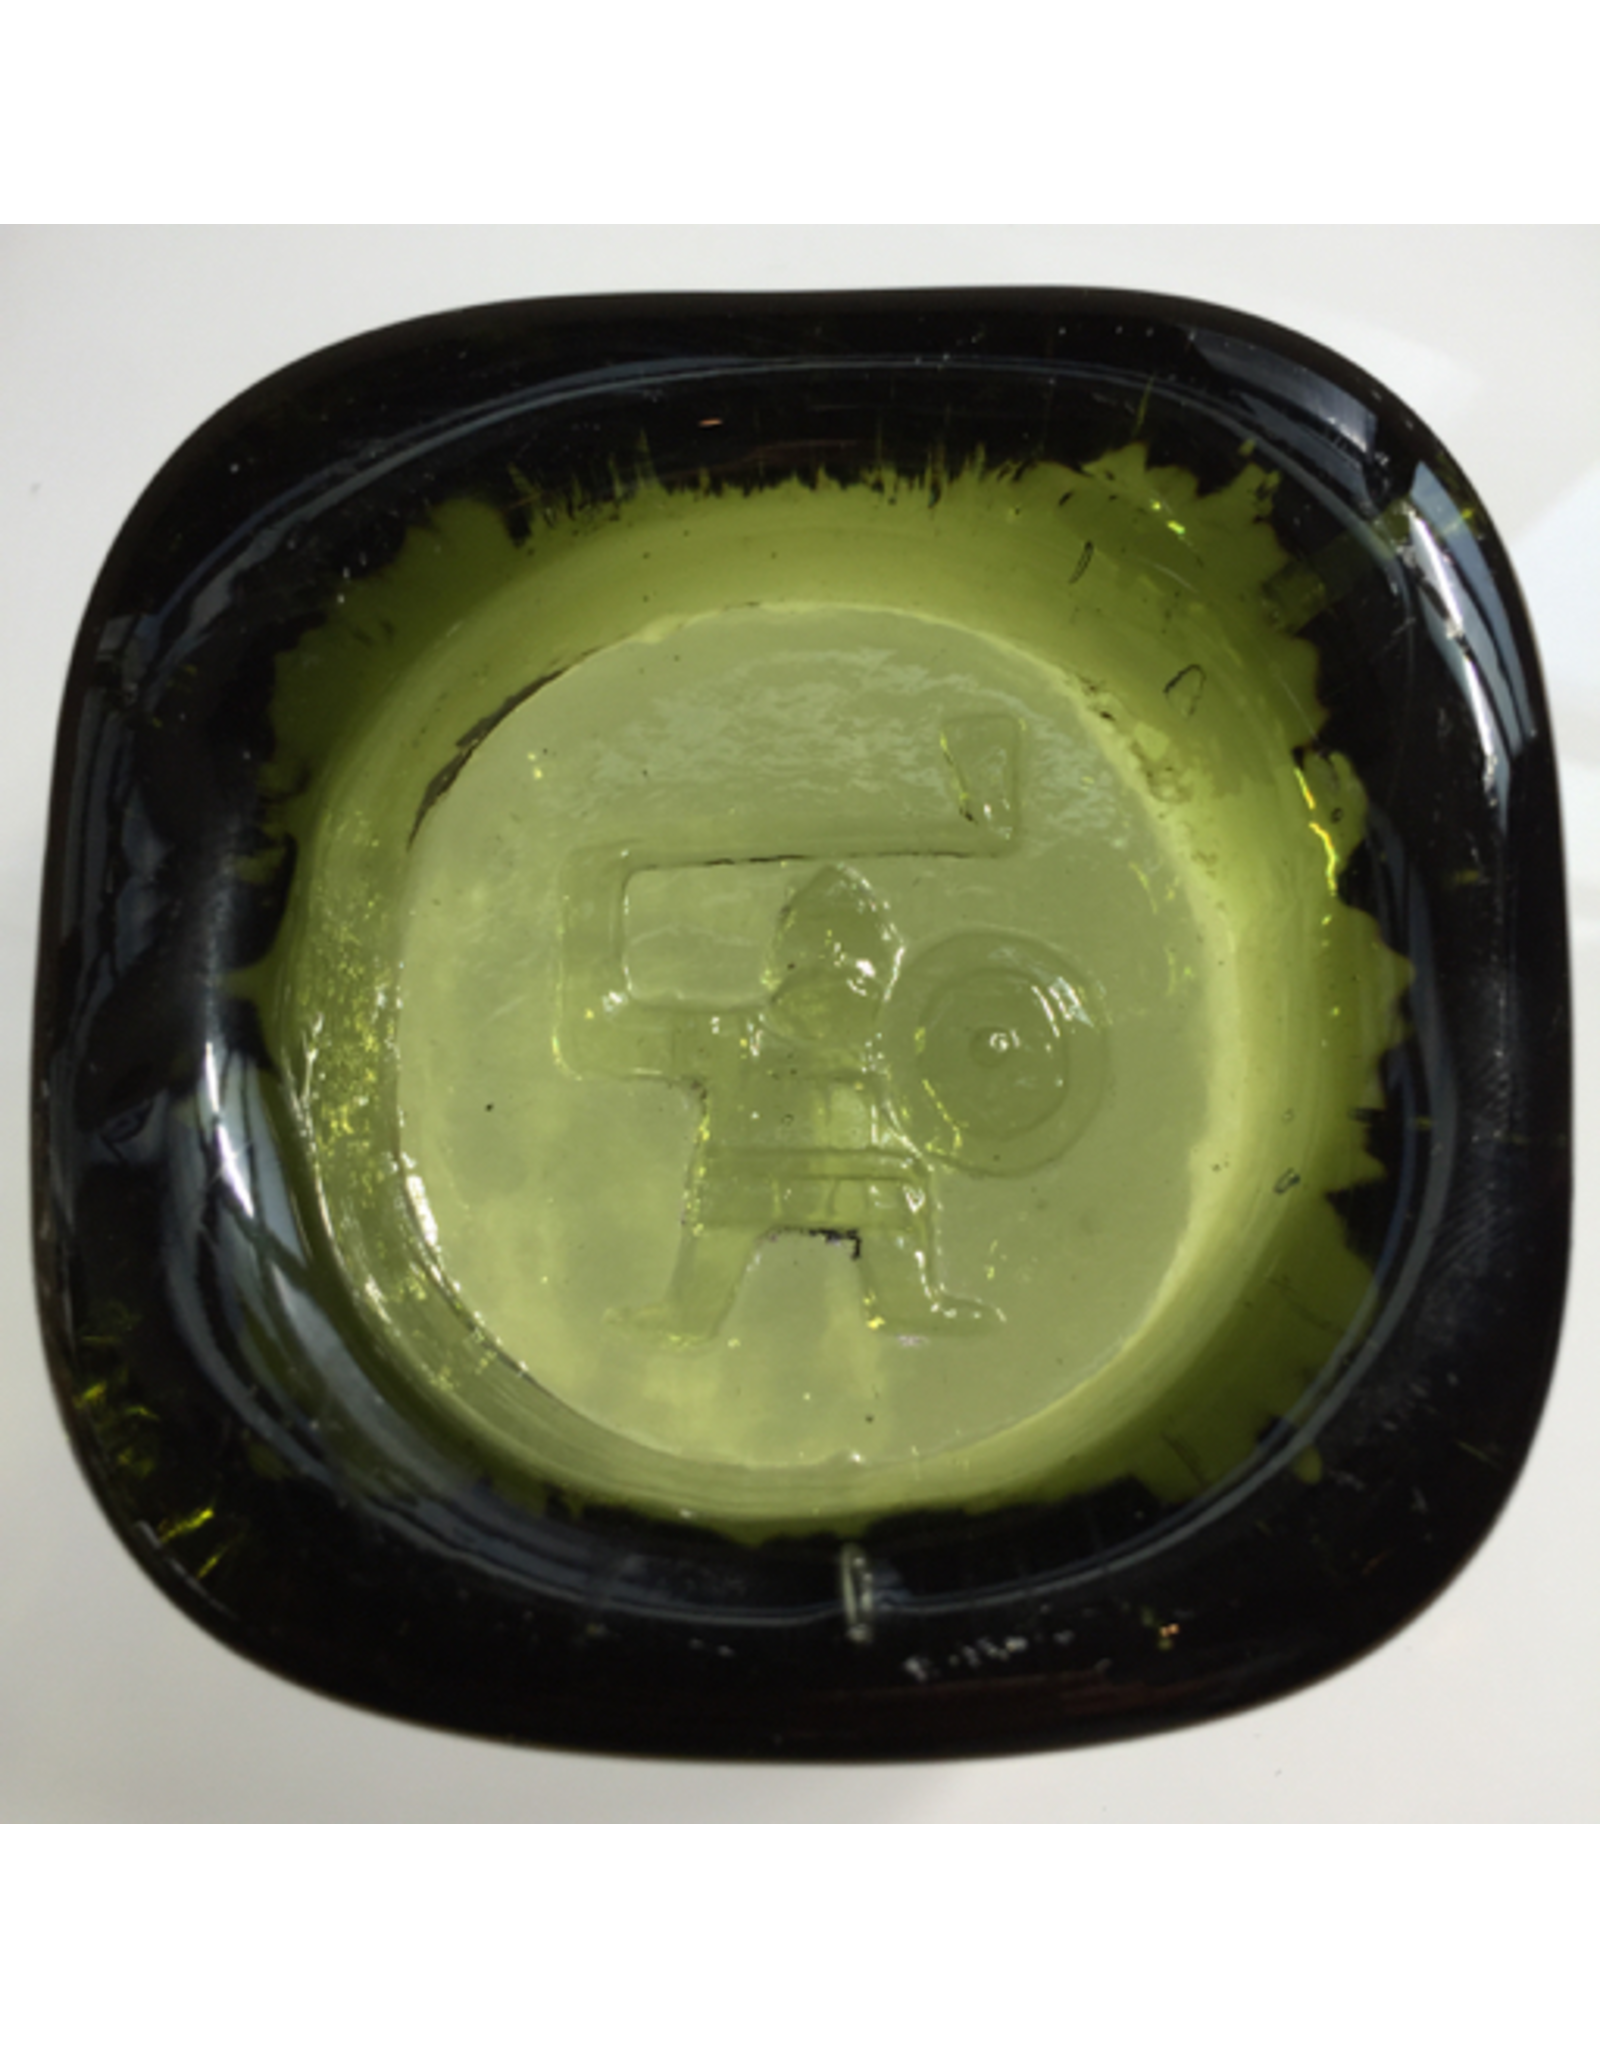 MANKS ANTIQUES GREEN GLASS 维京图标绿色玻璃